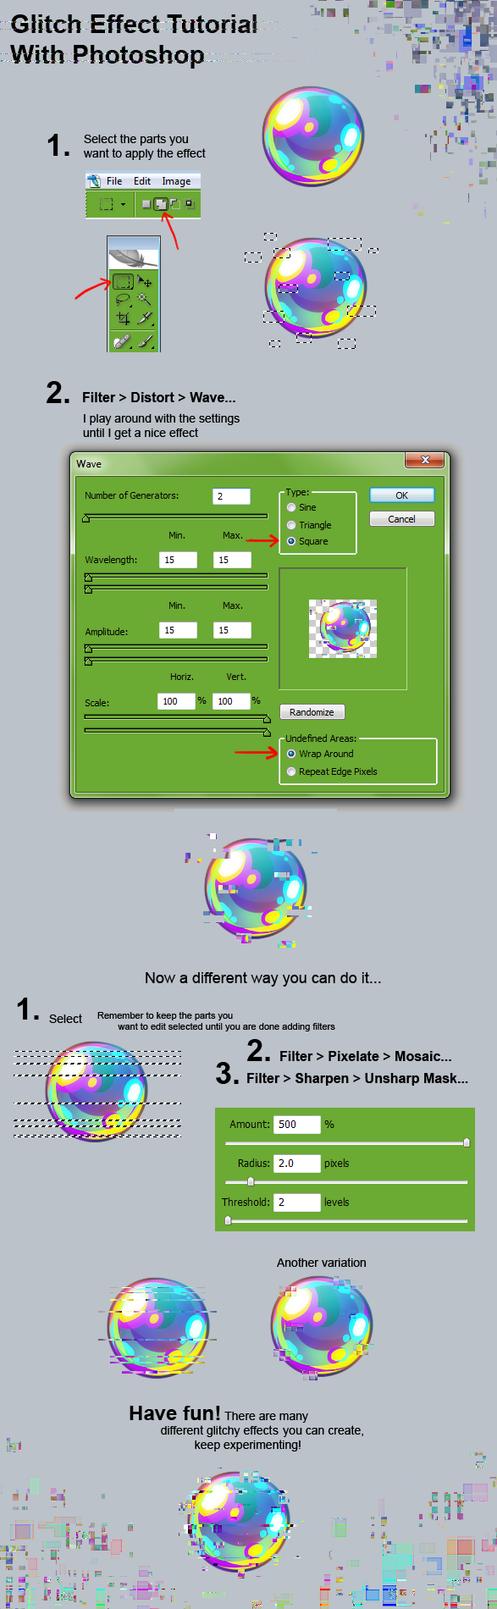 Glitch Effect Tutorial by Kawiku